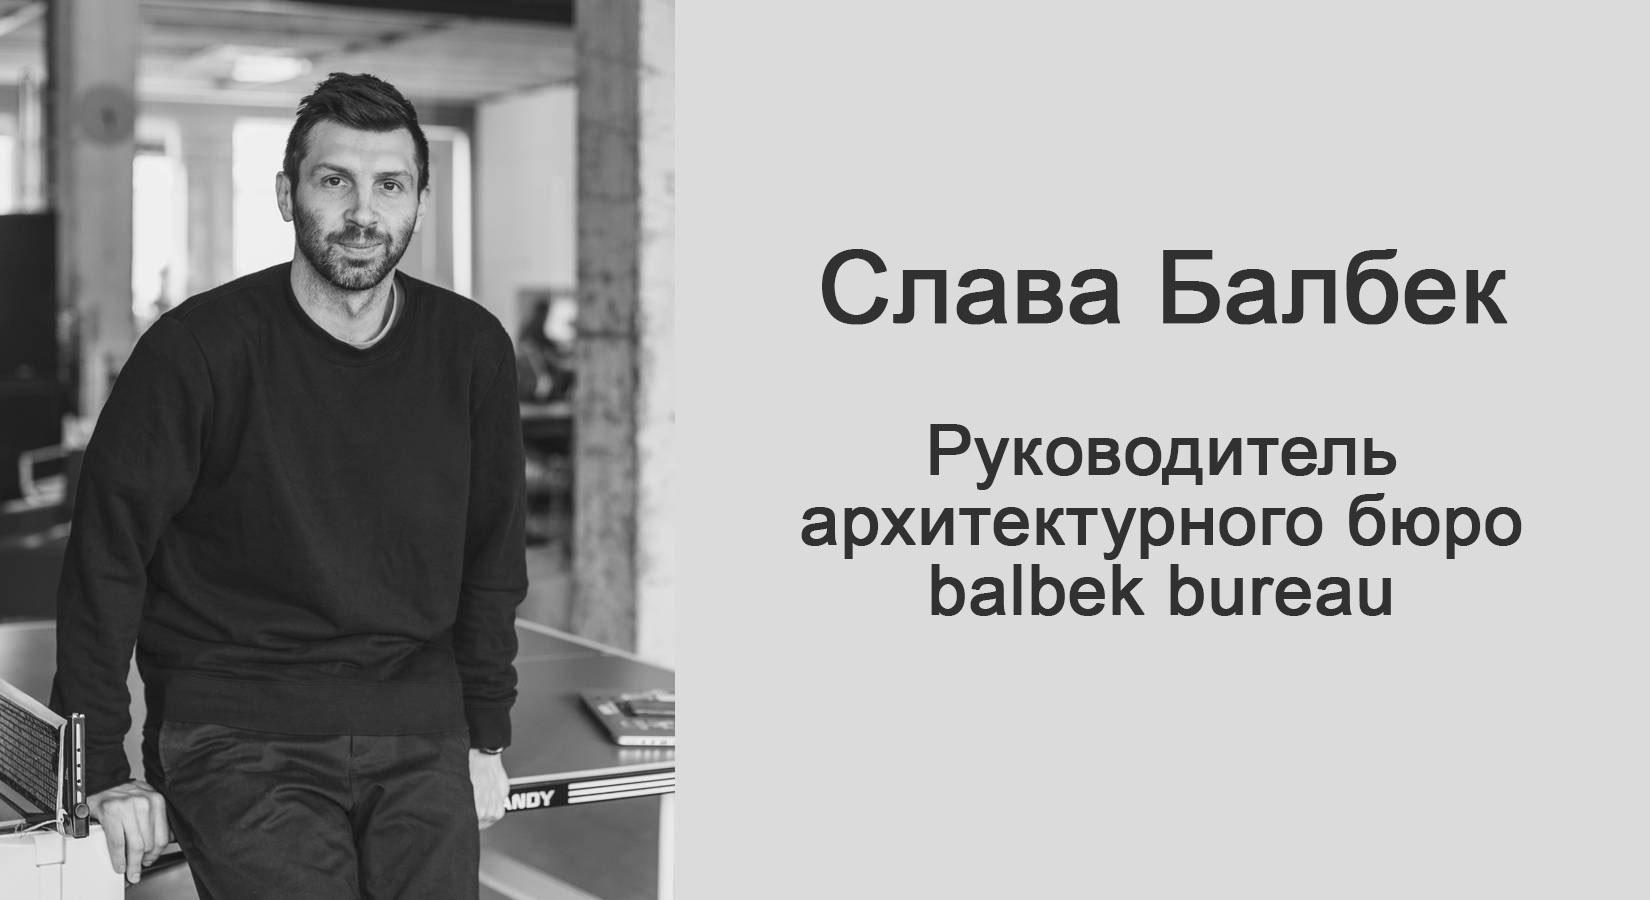 Інтерв'ю Слави Балбека (balbek bureau) бренду DAVIS CASA. Частина 1